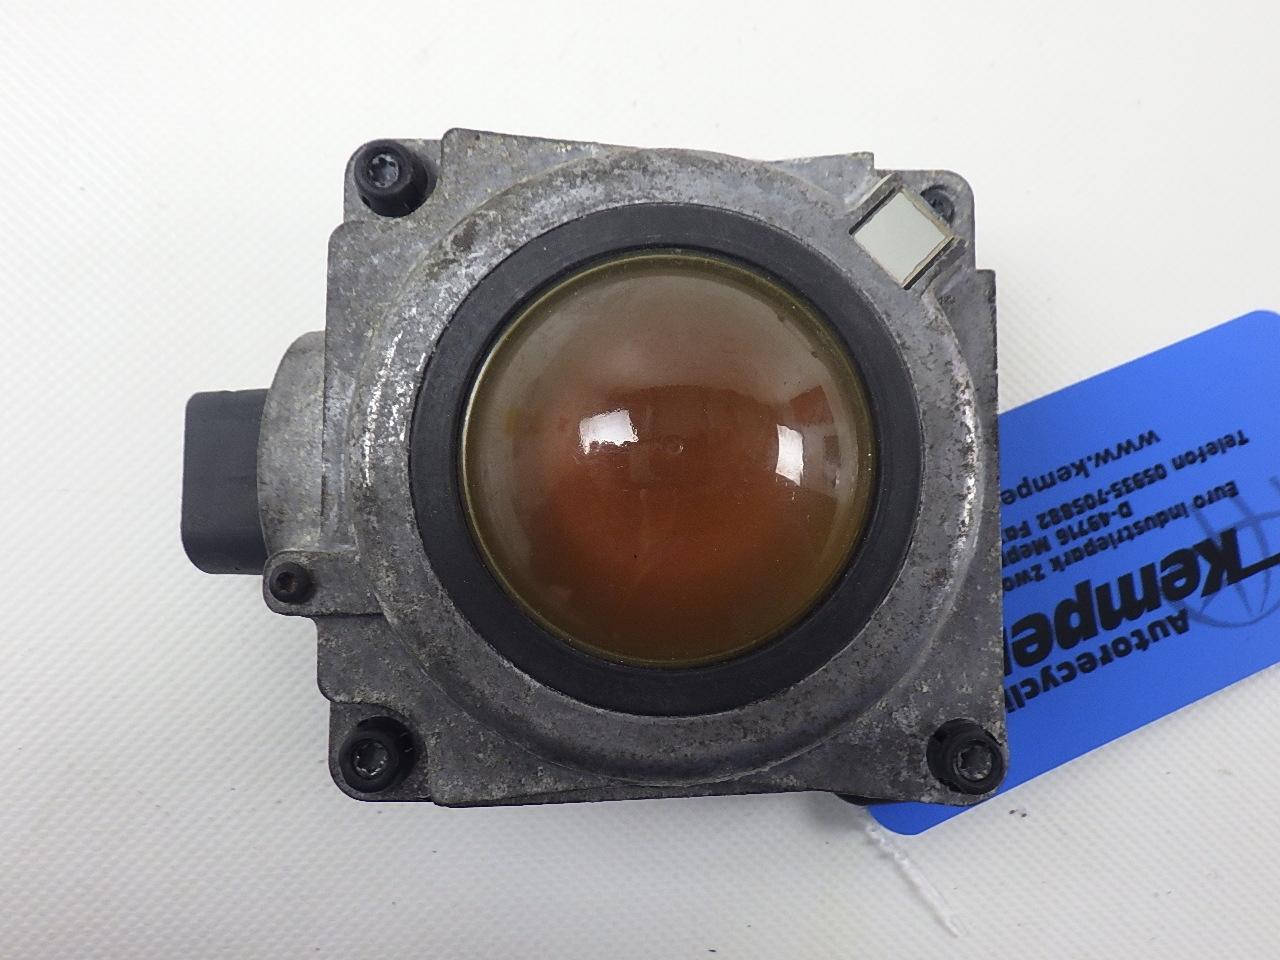 Spurwechselwarnung Sensor Radarsensor VW Passat 4Motion Santana CC 3AA907568C